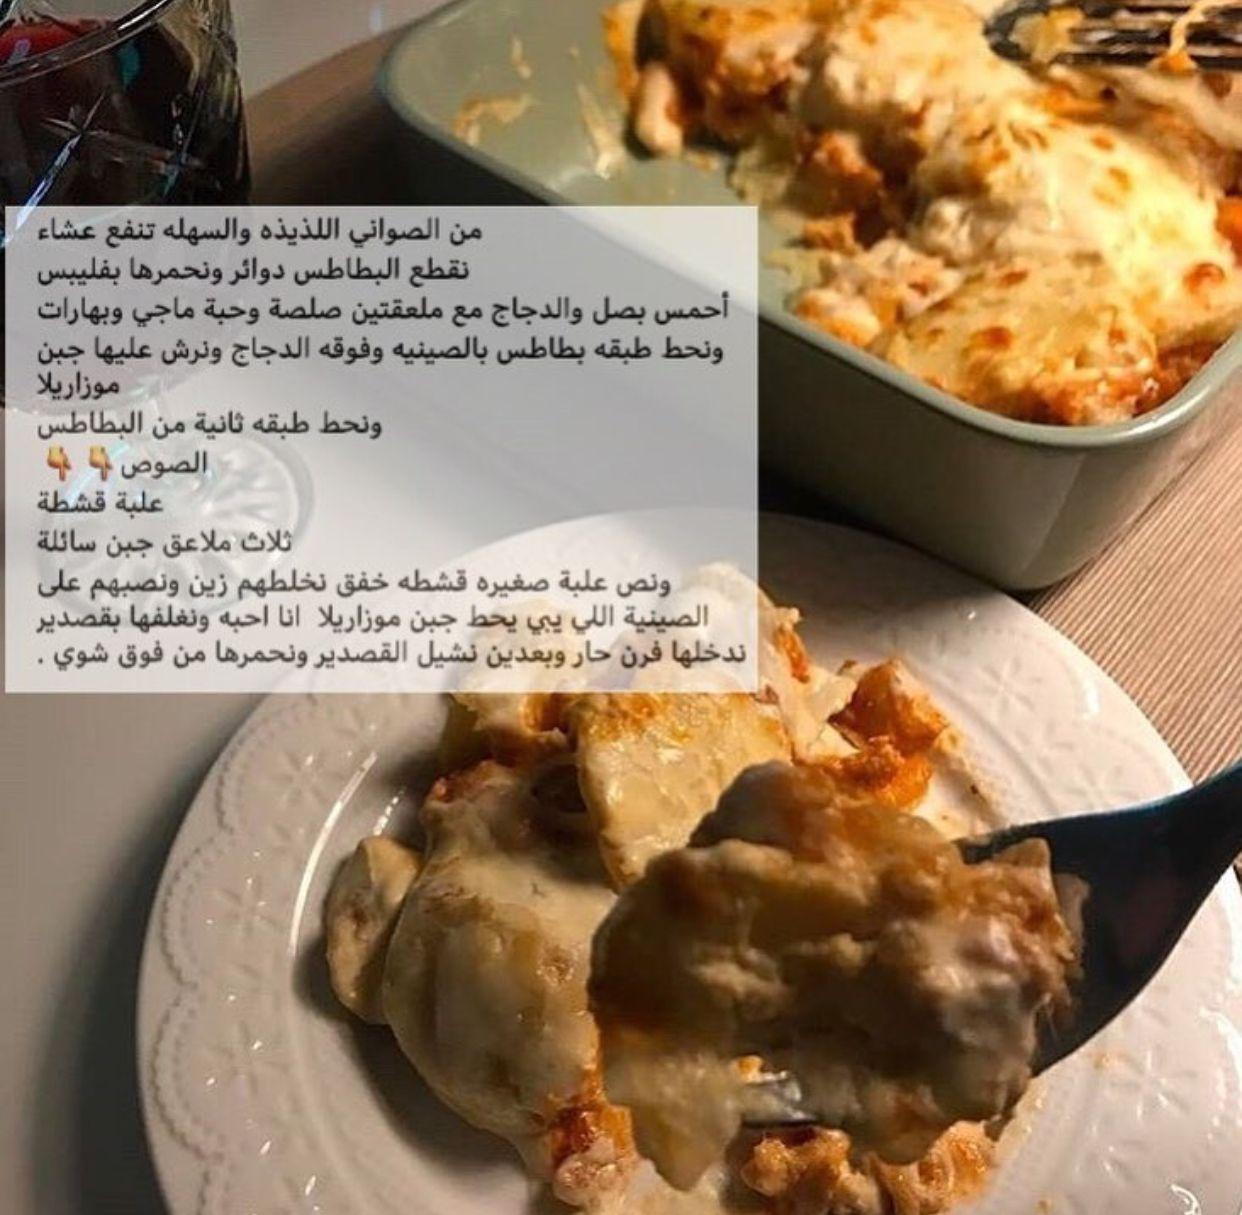 دجاج مع بطاط والكريمه Diy Food Recipes Cookout Food Food Receipes